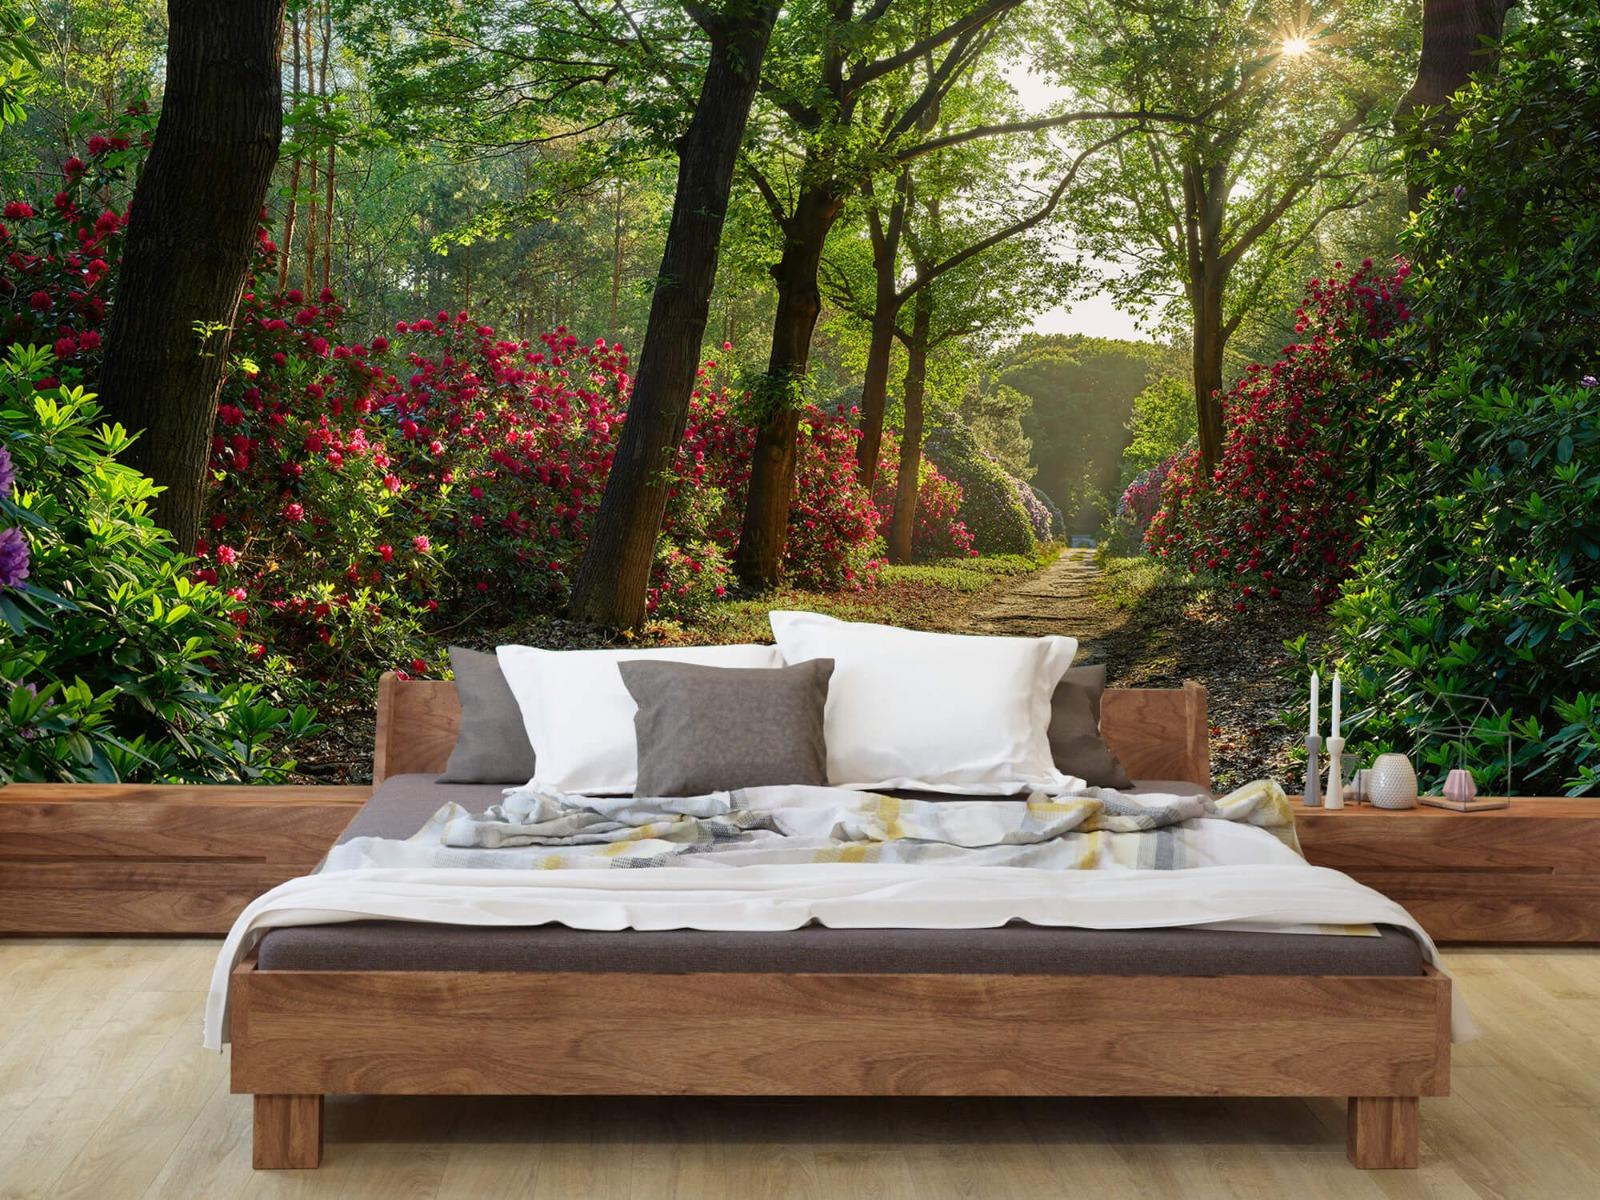 Bos - Zonsopkomst bij pad met rhododendrons 9